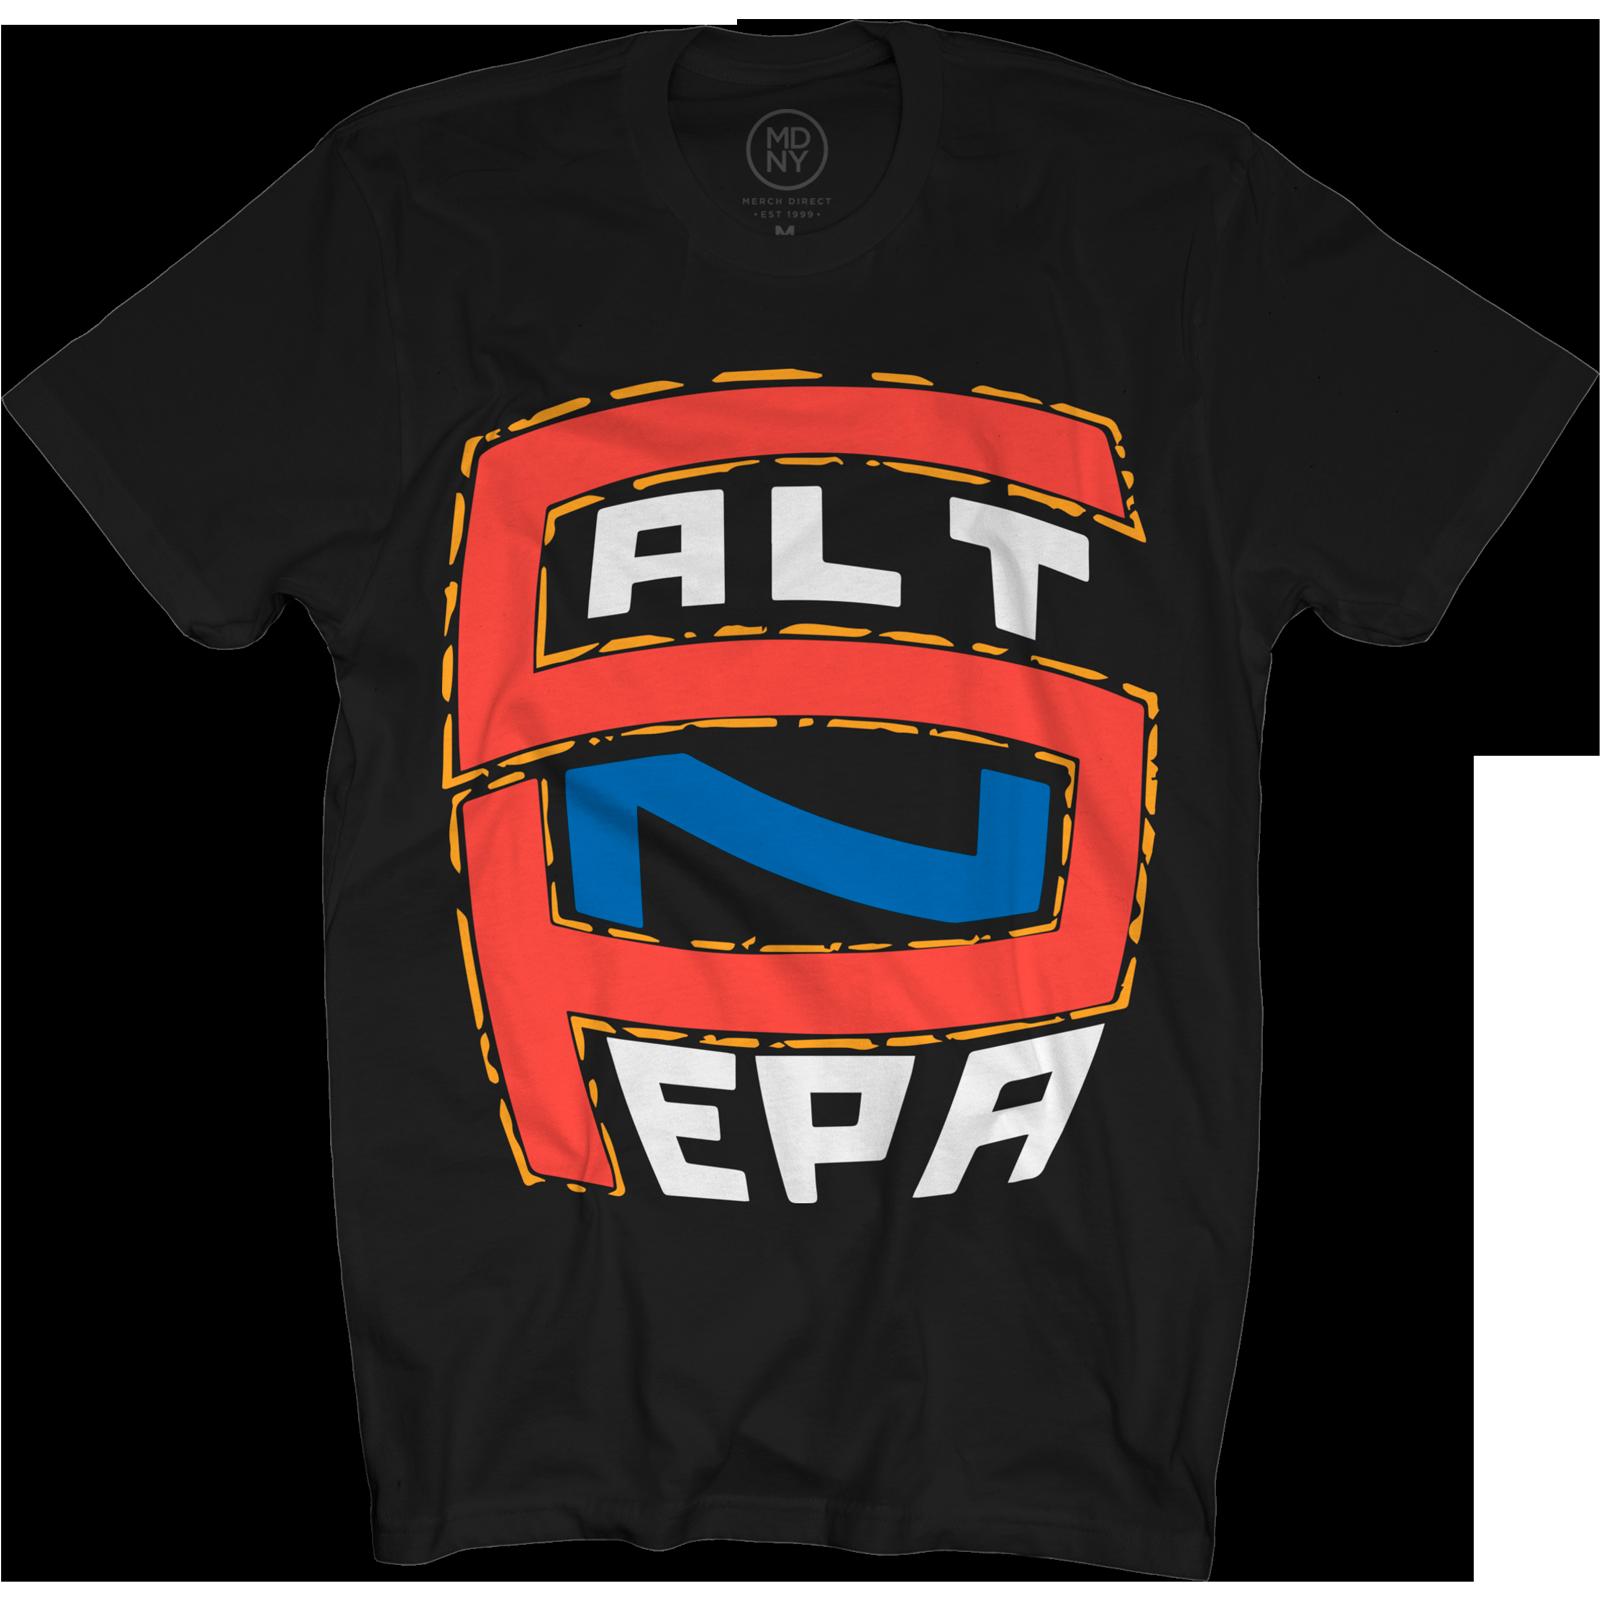 Red & Blue Logo on Black T-Shirt